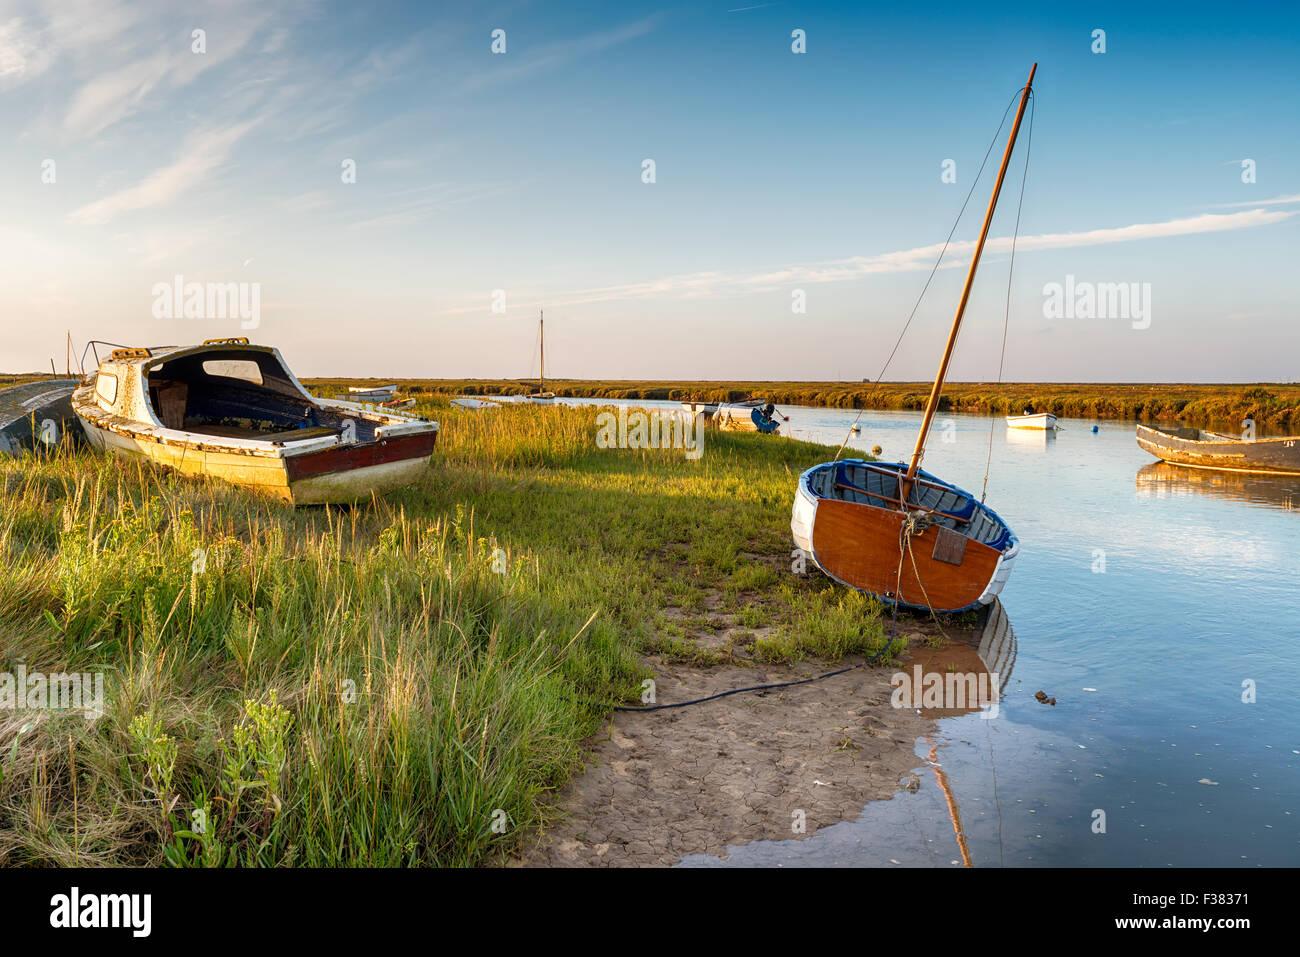 Fishing boats on the salt marshes at Blakeney on the Norfolk coast - Stock Image